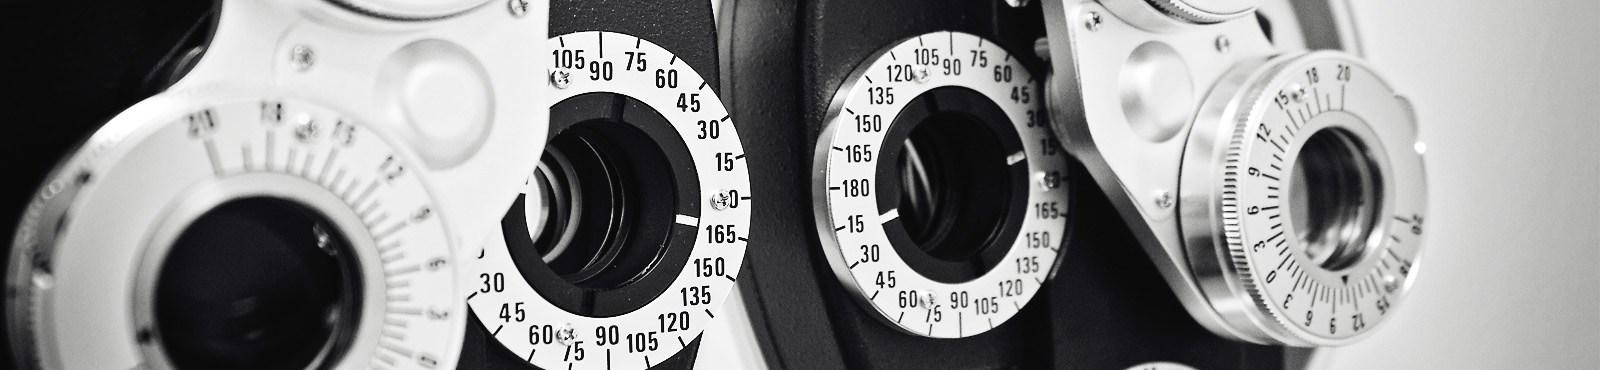 Modern diagnostic and eye examination equipment